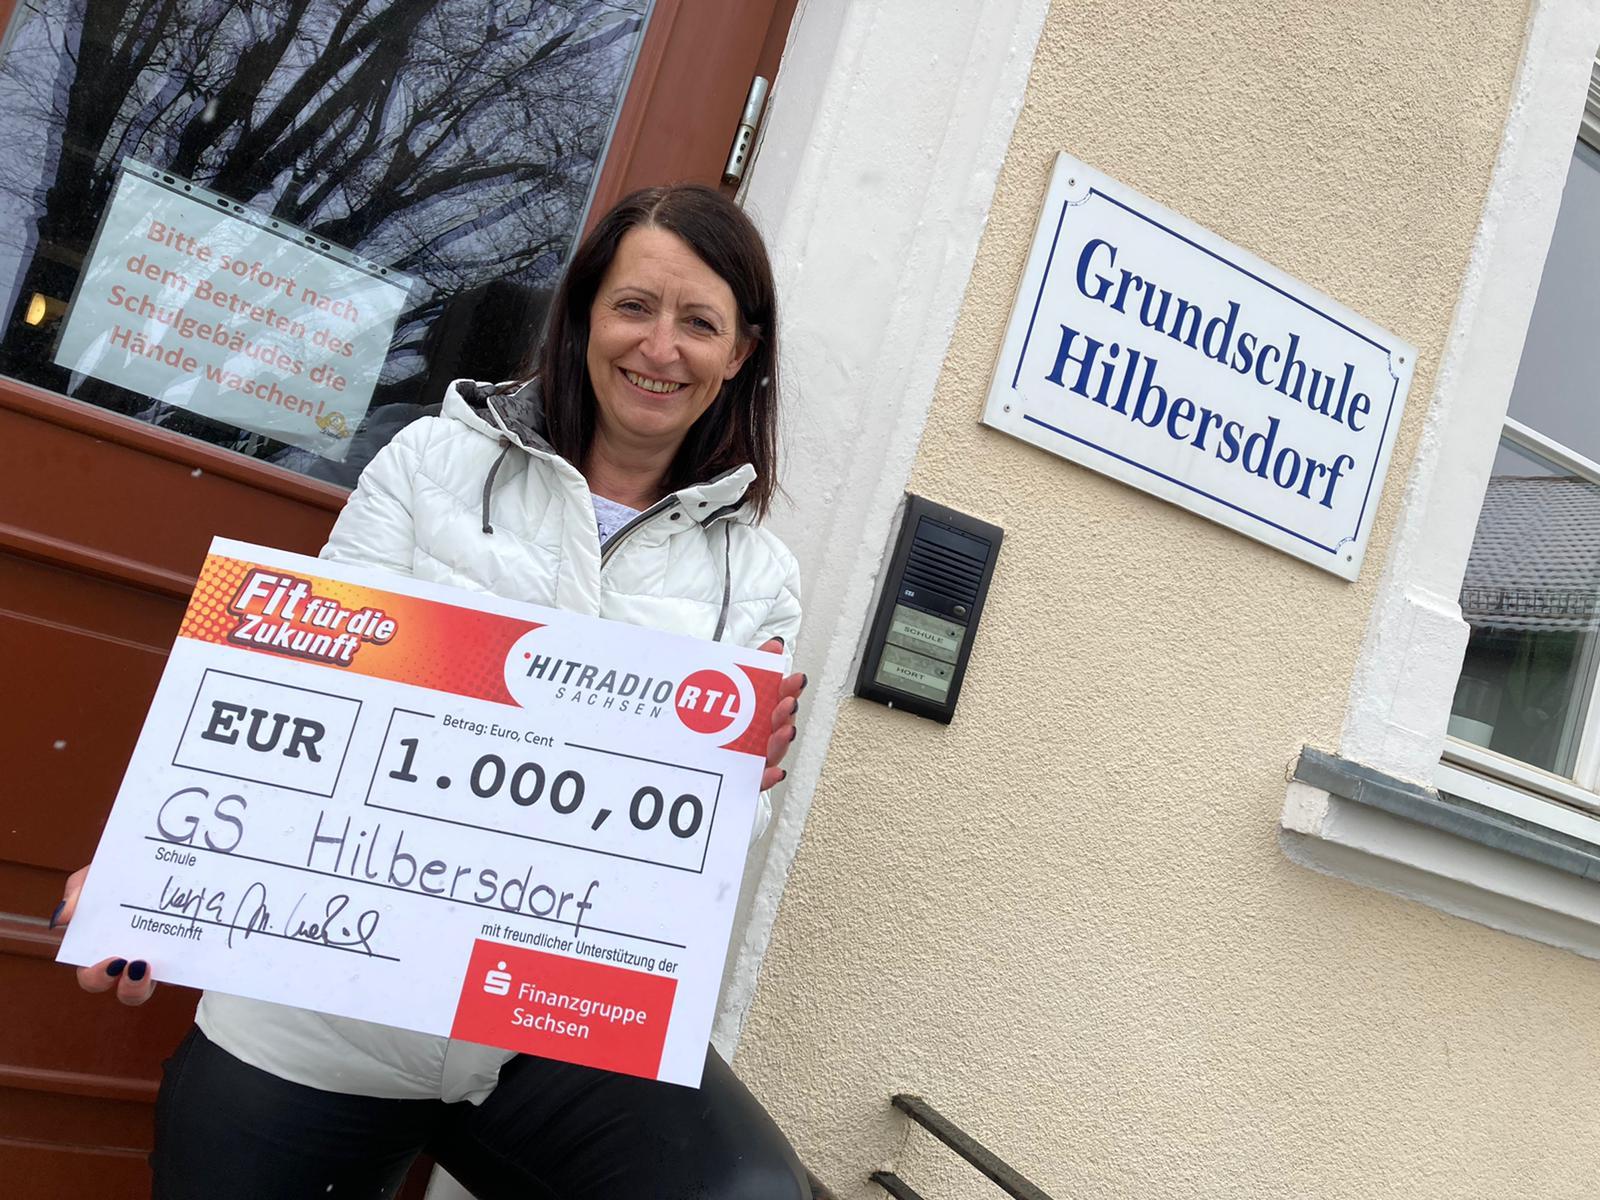 1.000 € von Hitradio RTL